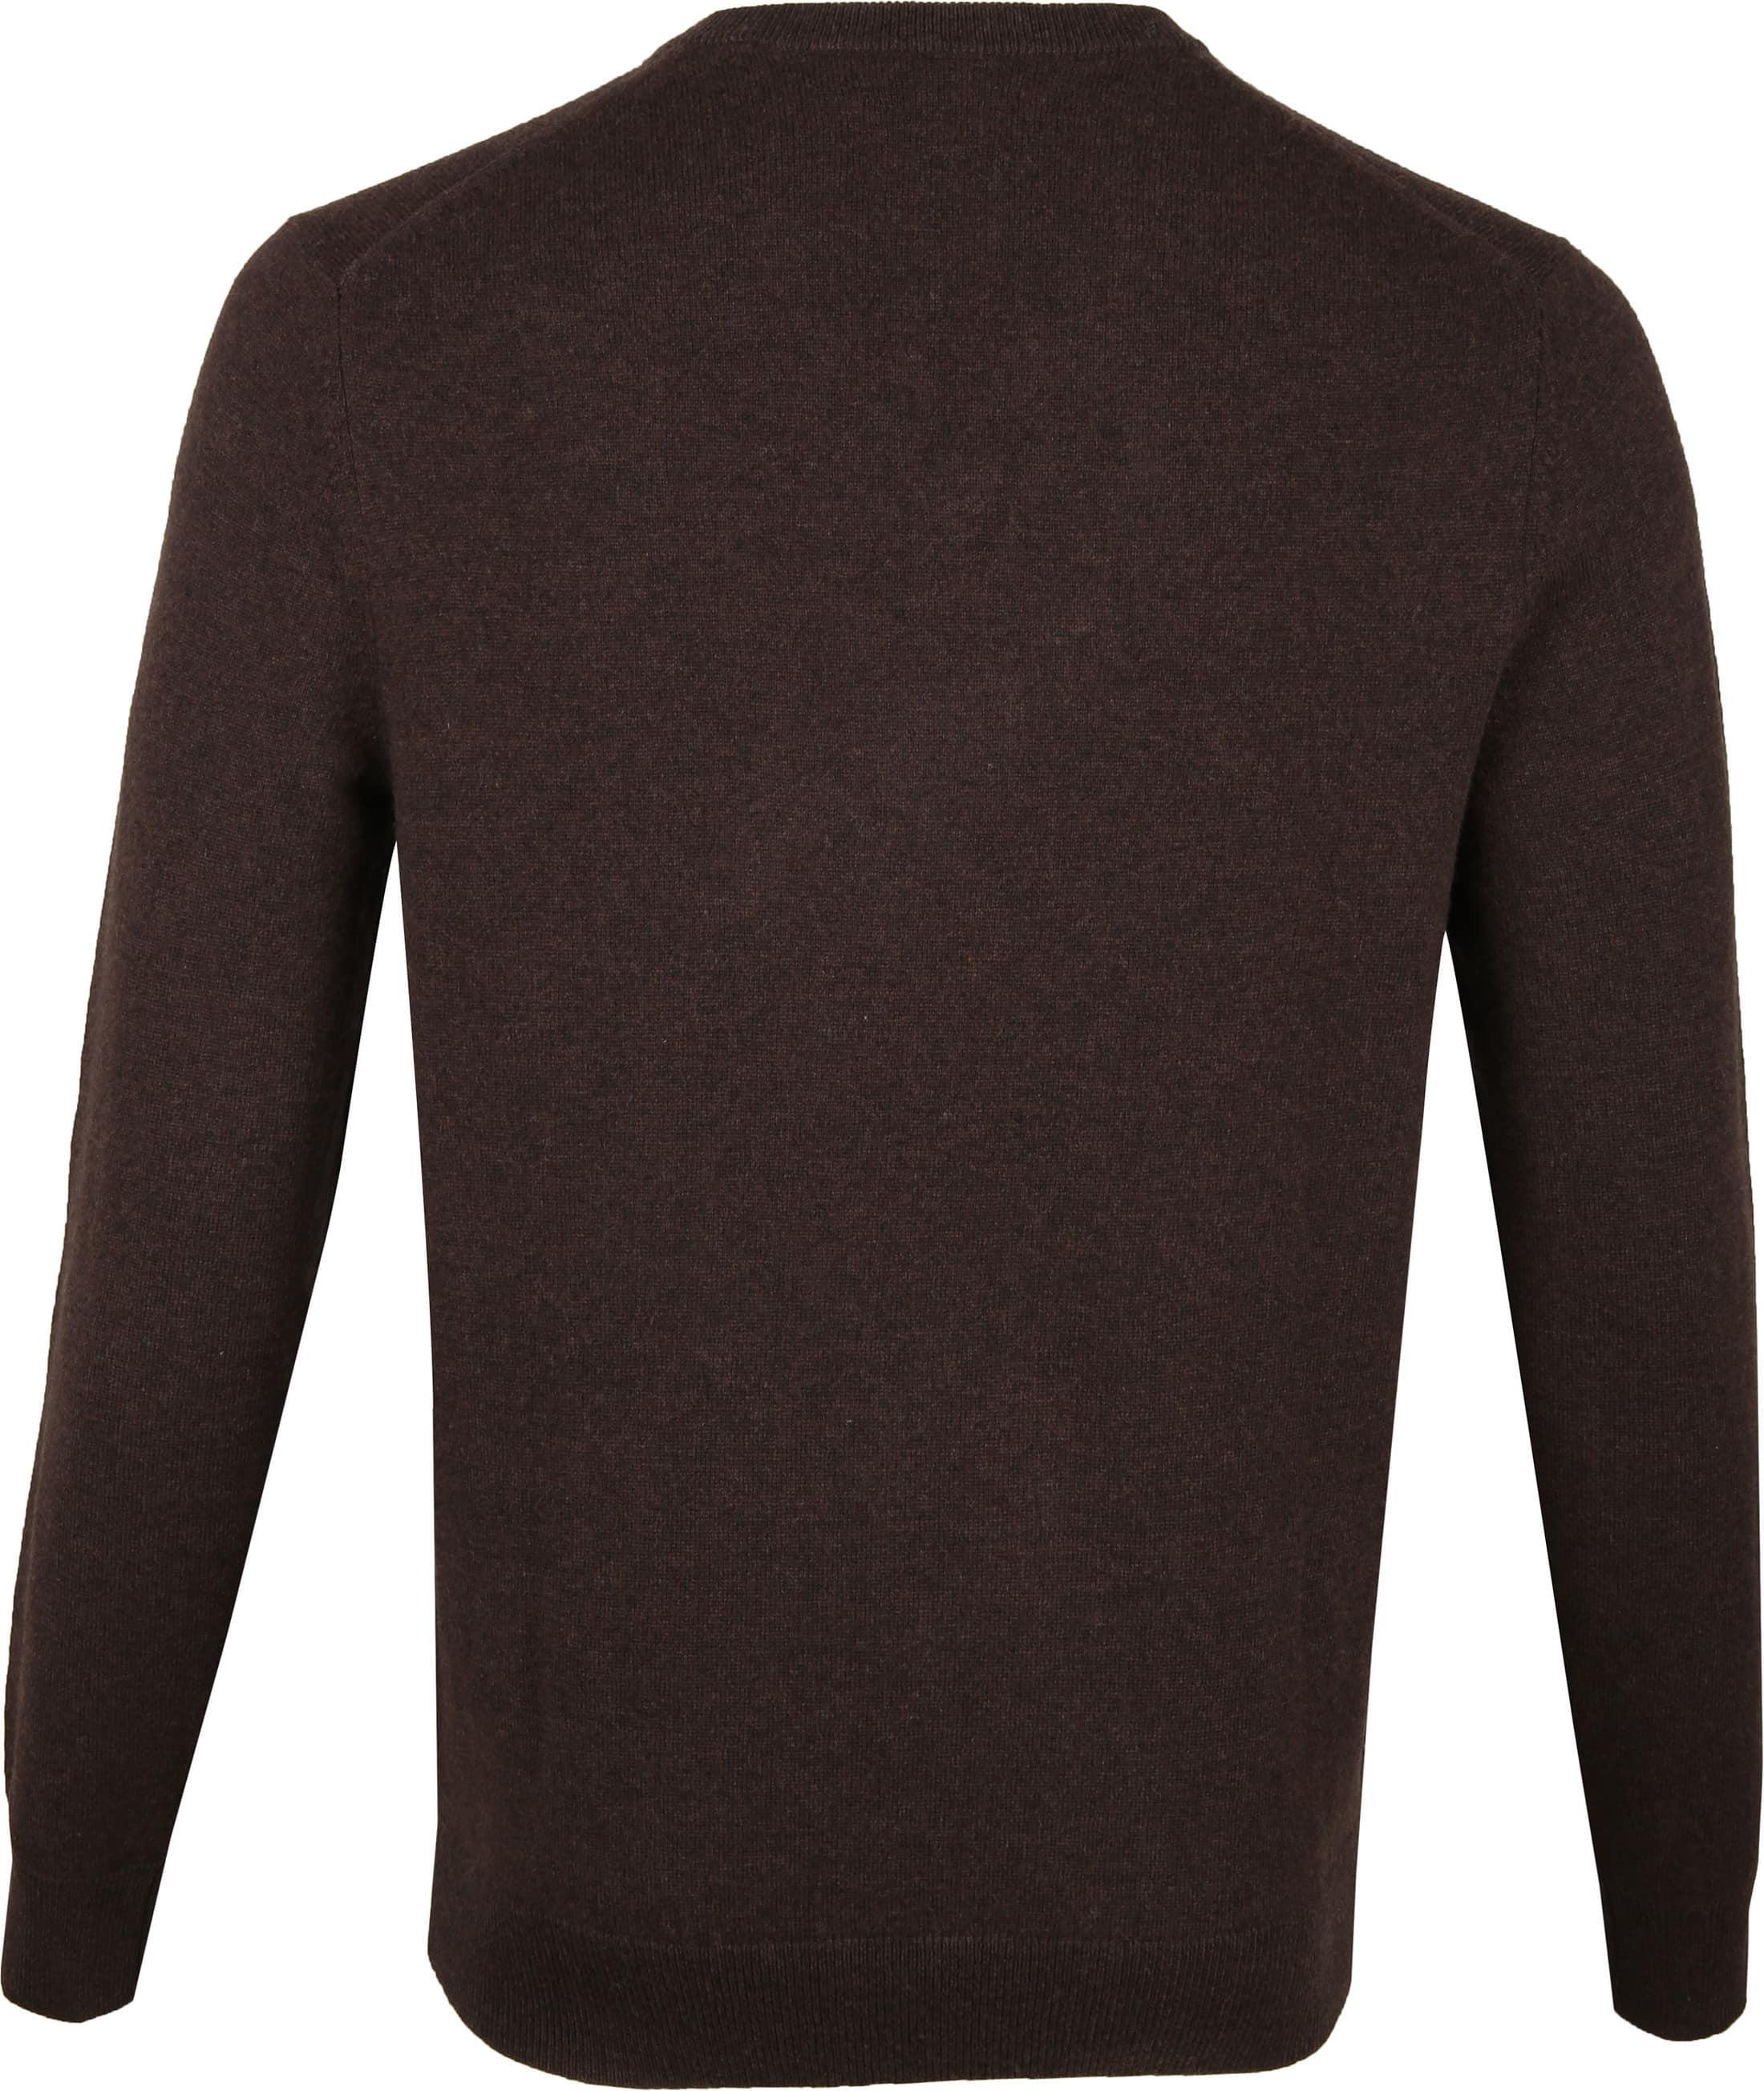 Gant Pullover Lambswool Dark Brown foto 3